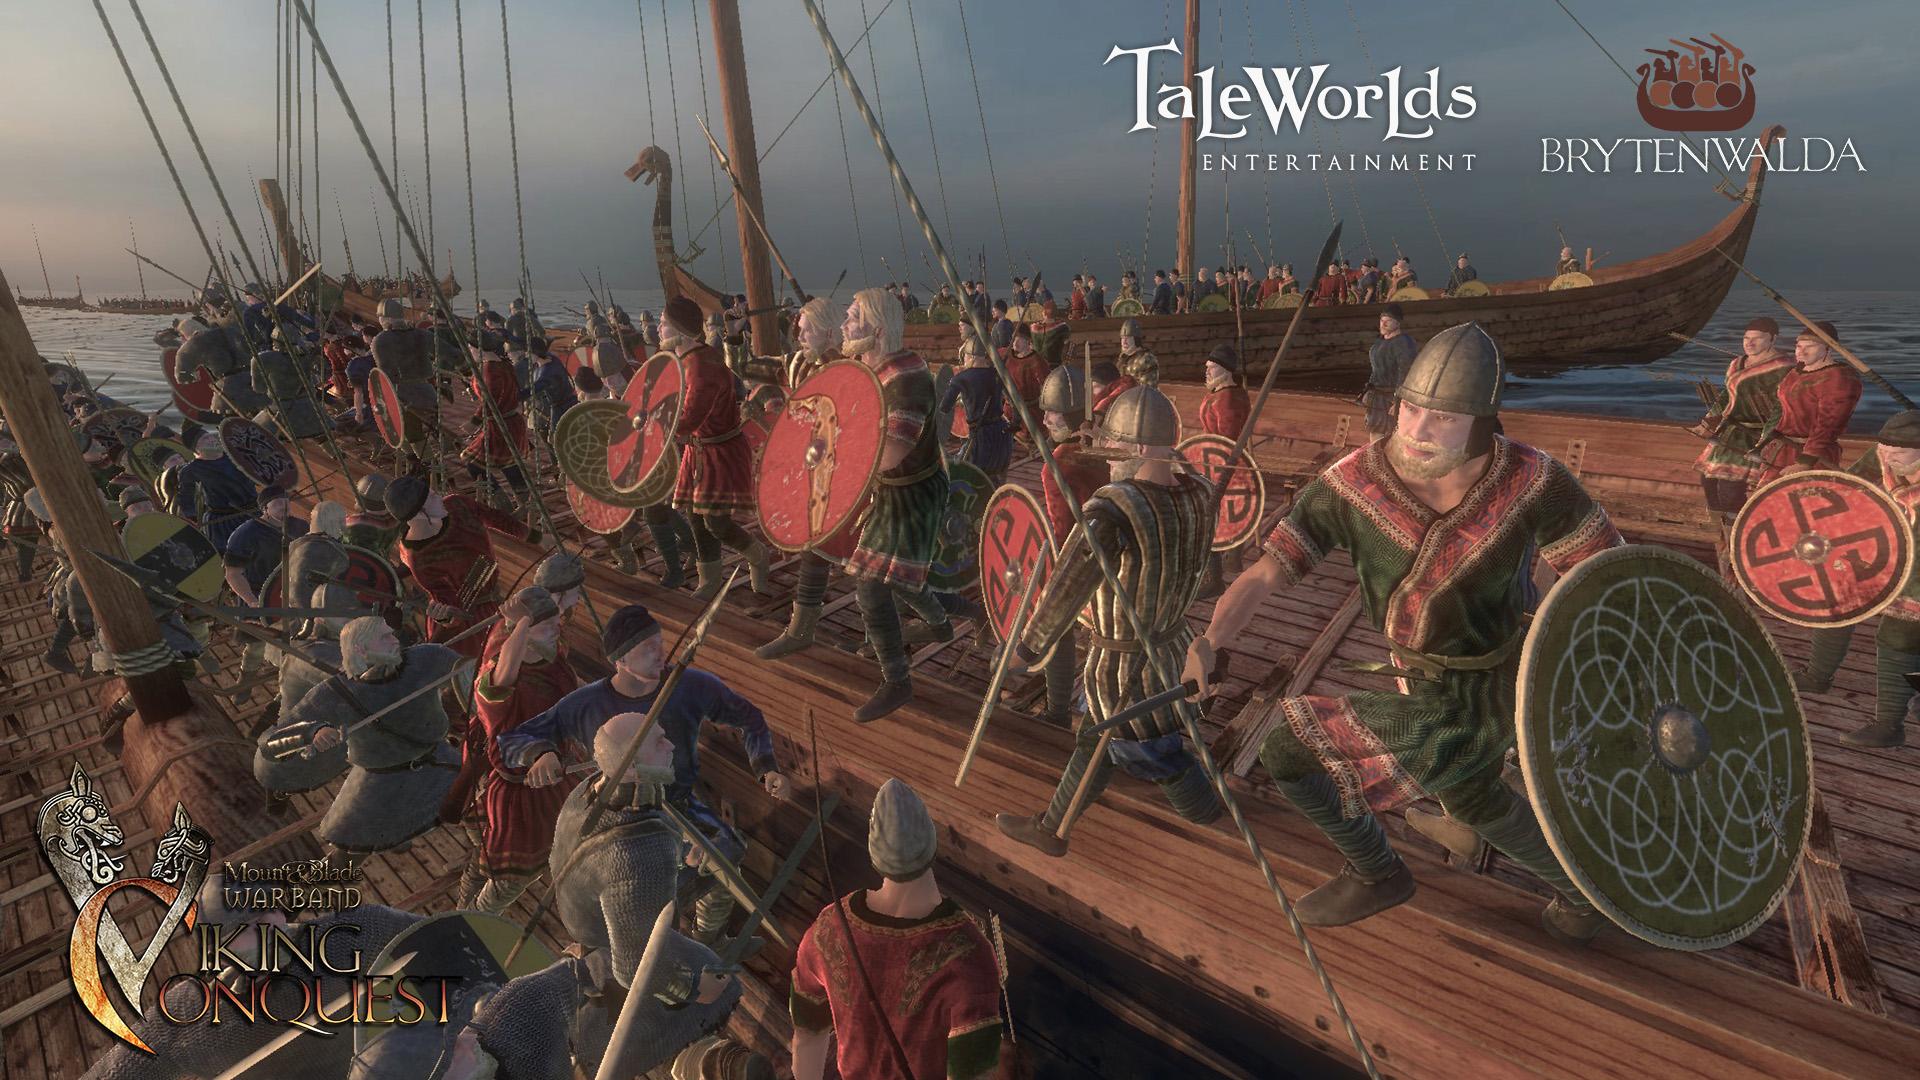 Viking Conquest: discusión general - Página 5 Ca7ee812b7b525c35ddb64dce5fde5d65118bcbf